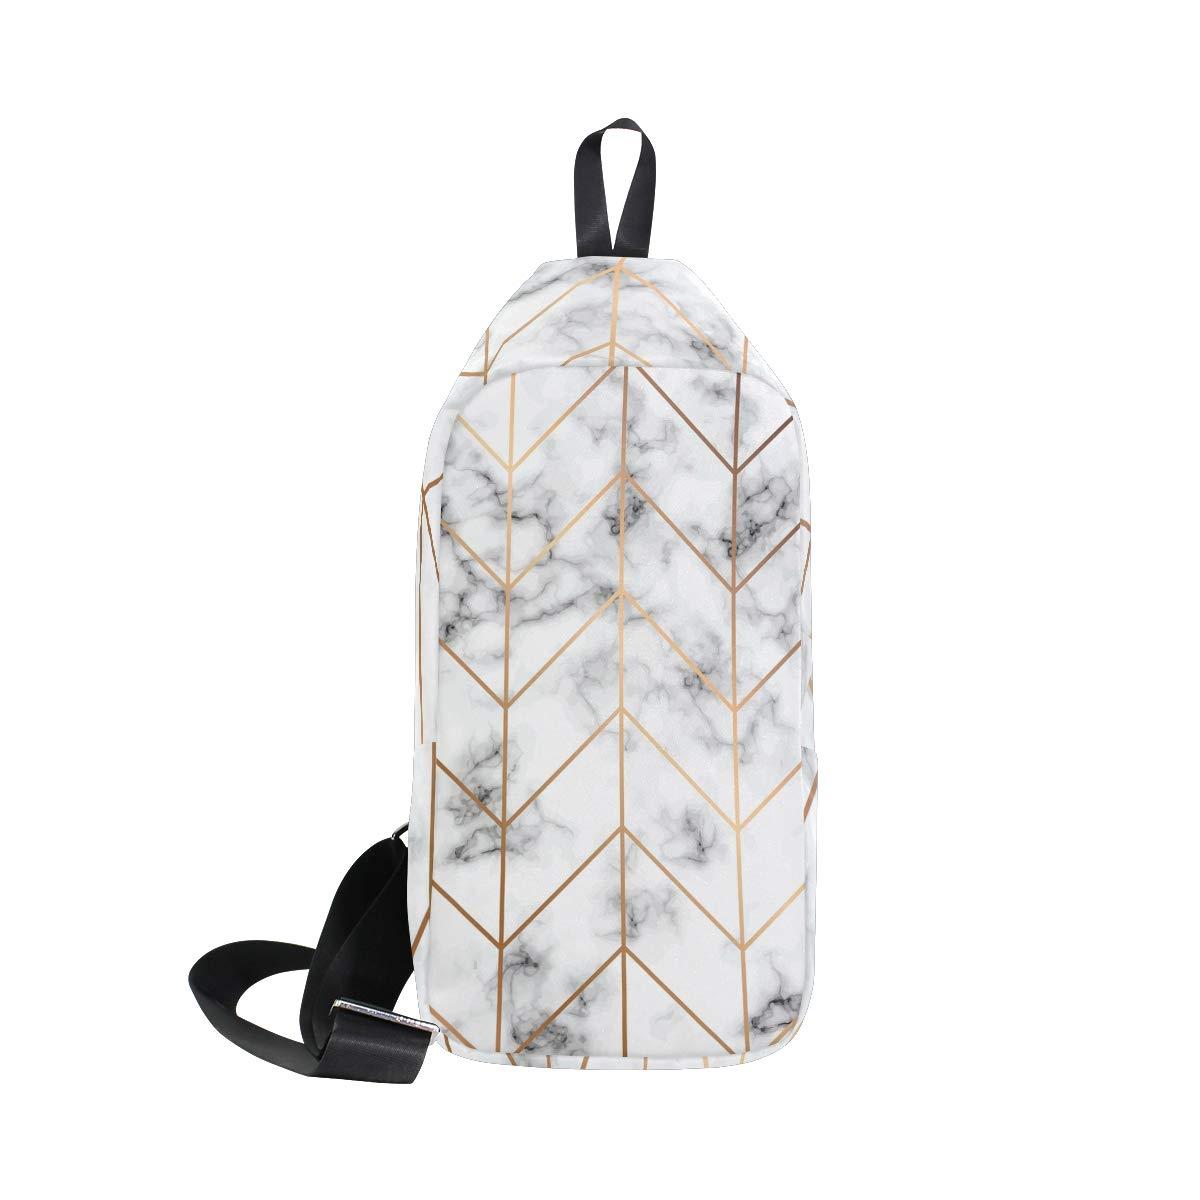 TFONE Abstract Art Marble Crossbody Bag Lightweight Chest Shoulder Messenger Pack Backpack Sling Bag